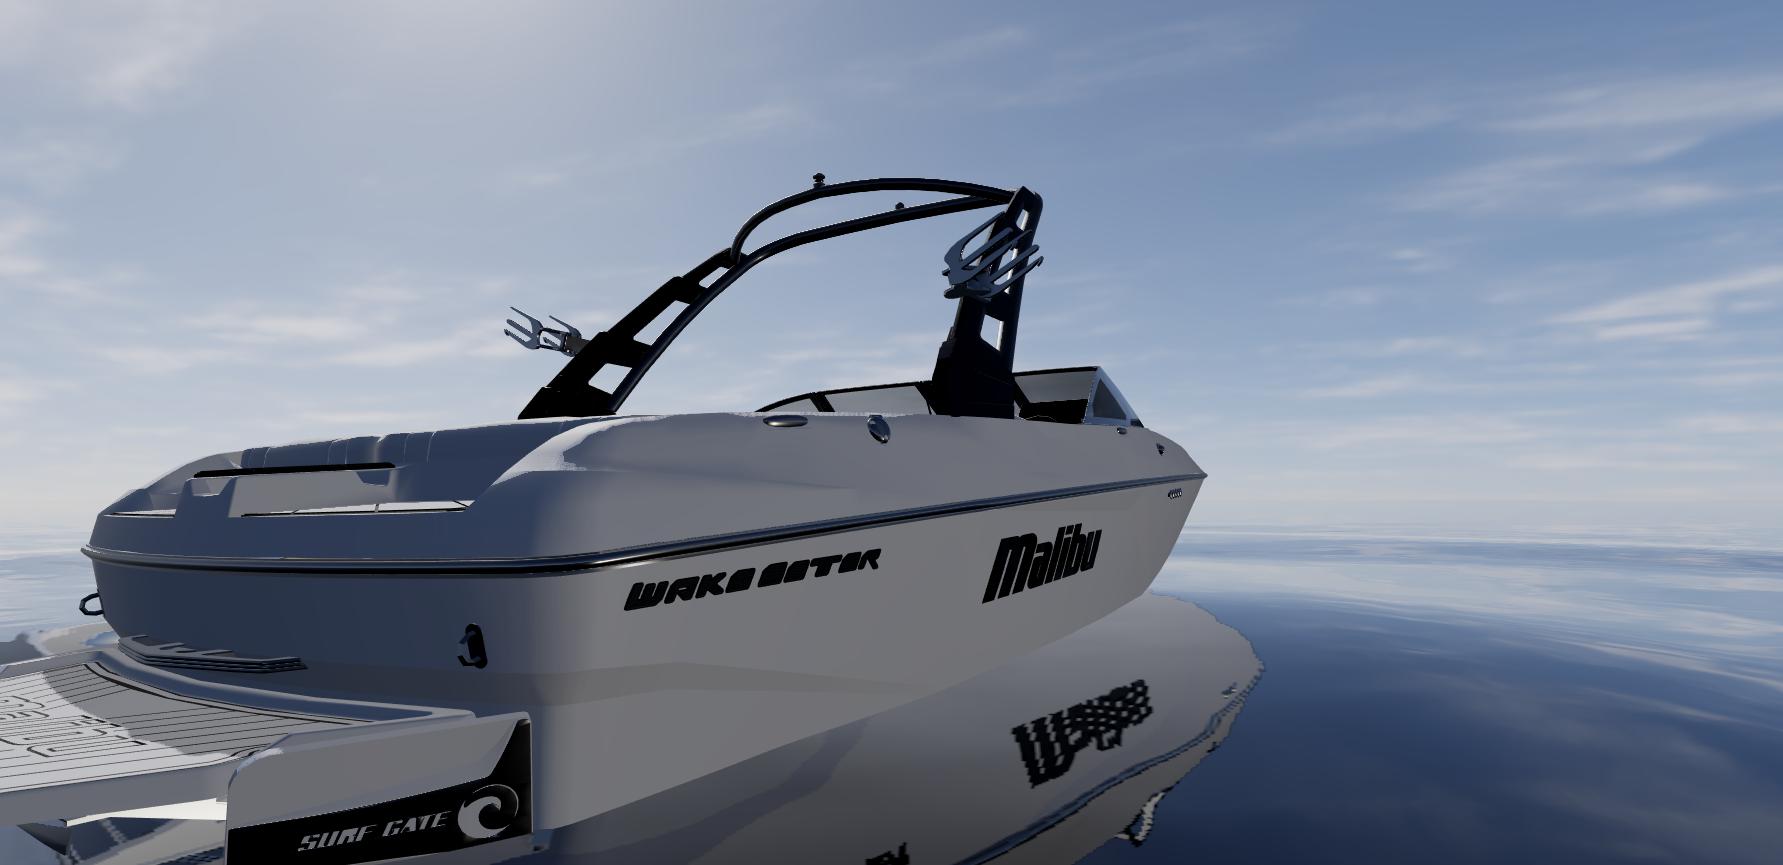 Malibu Wakesetter speedboat in the water